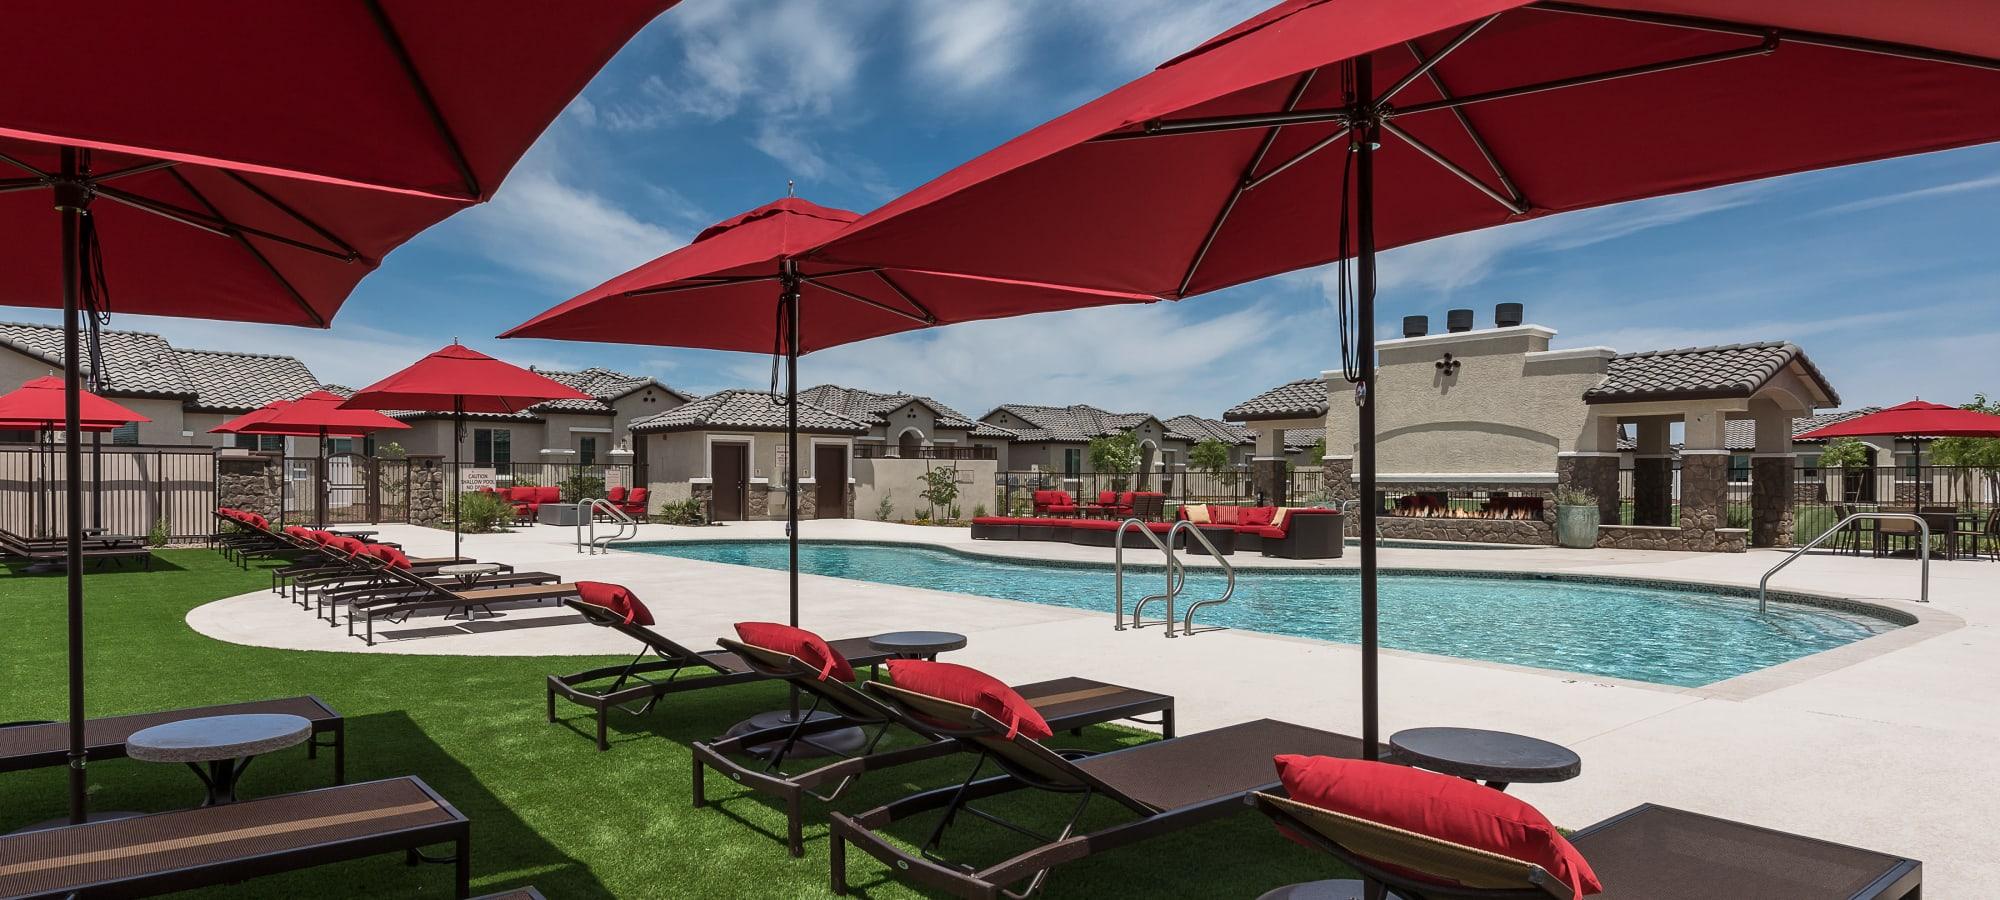 Resort style pool at TerraLane at Canyon Trails in Goodyear, Arizona